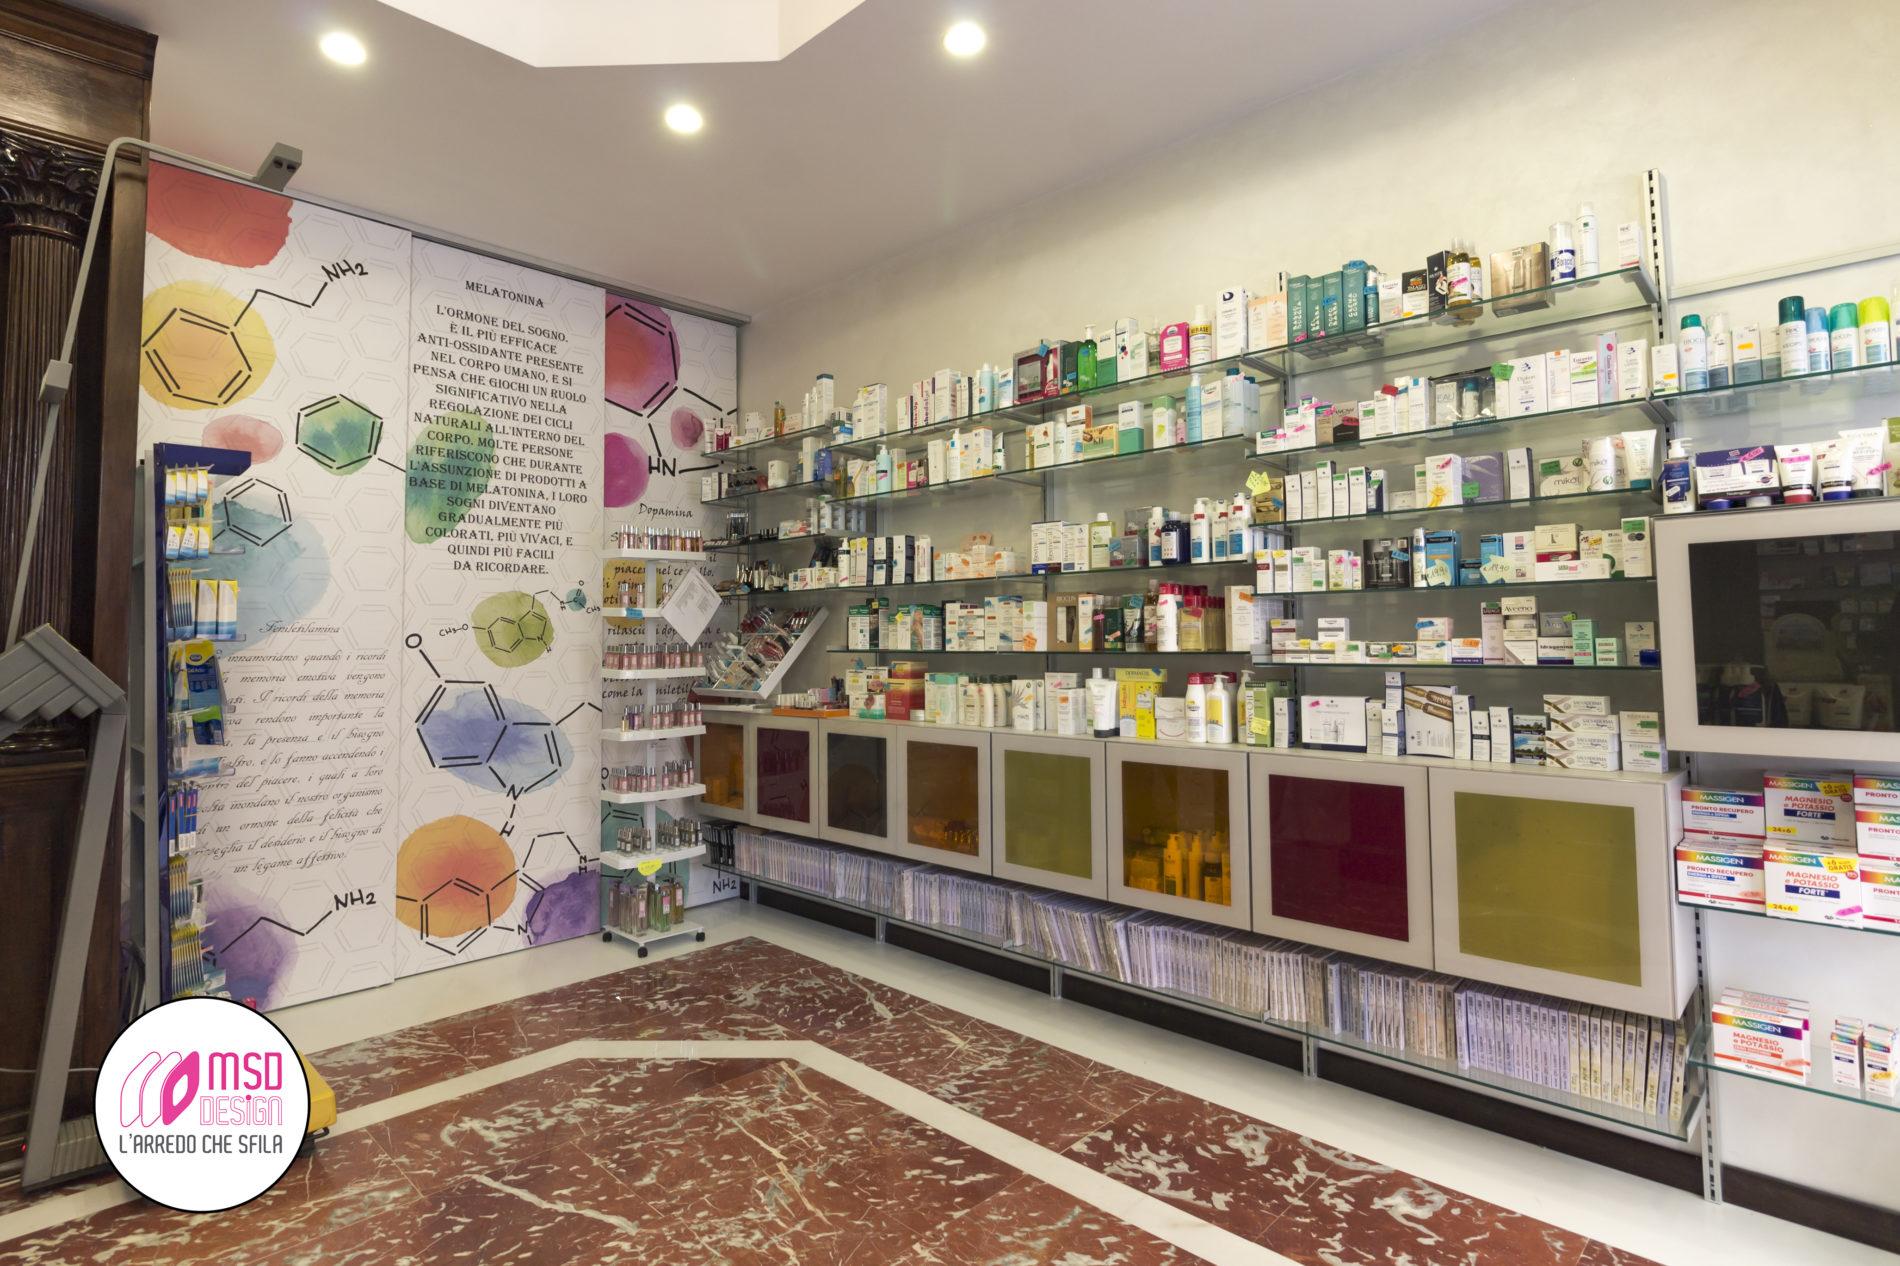 IMG 6099 - Farmacia